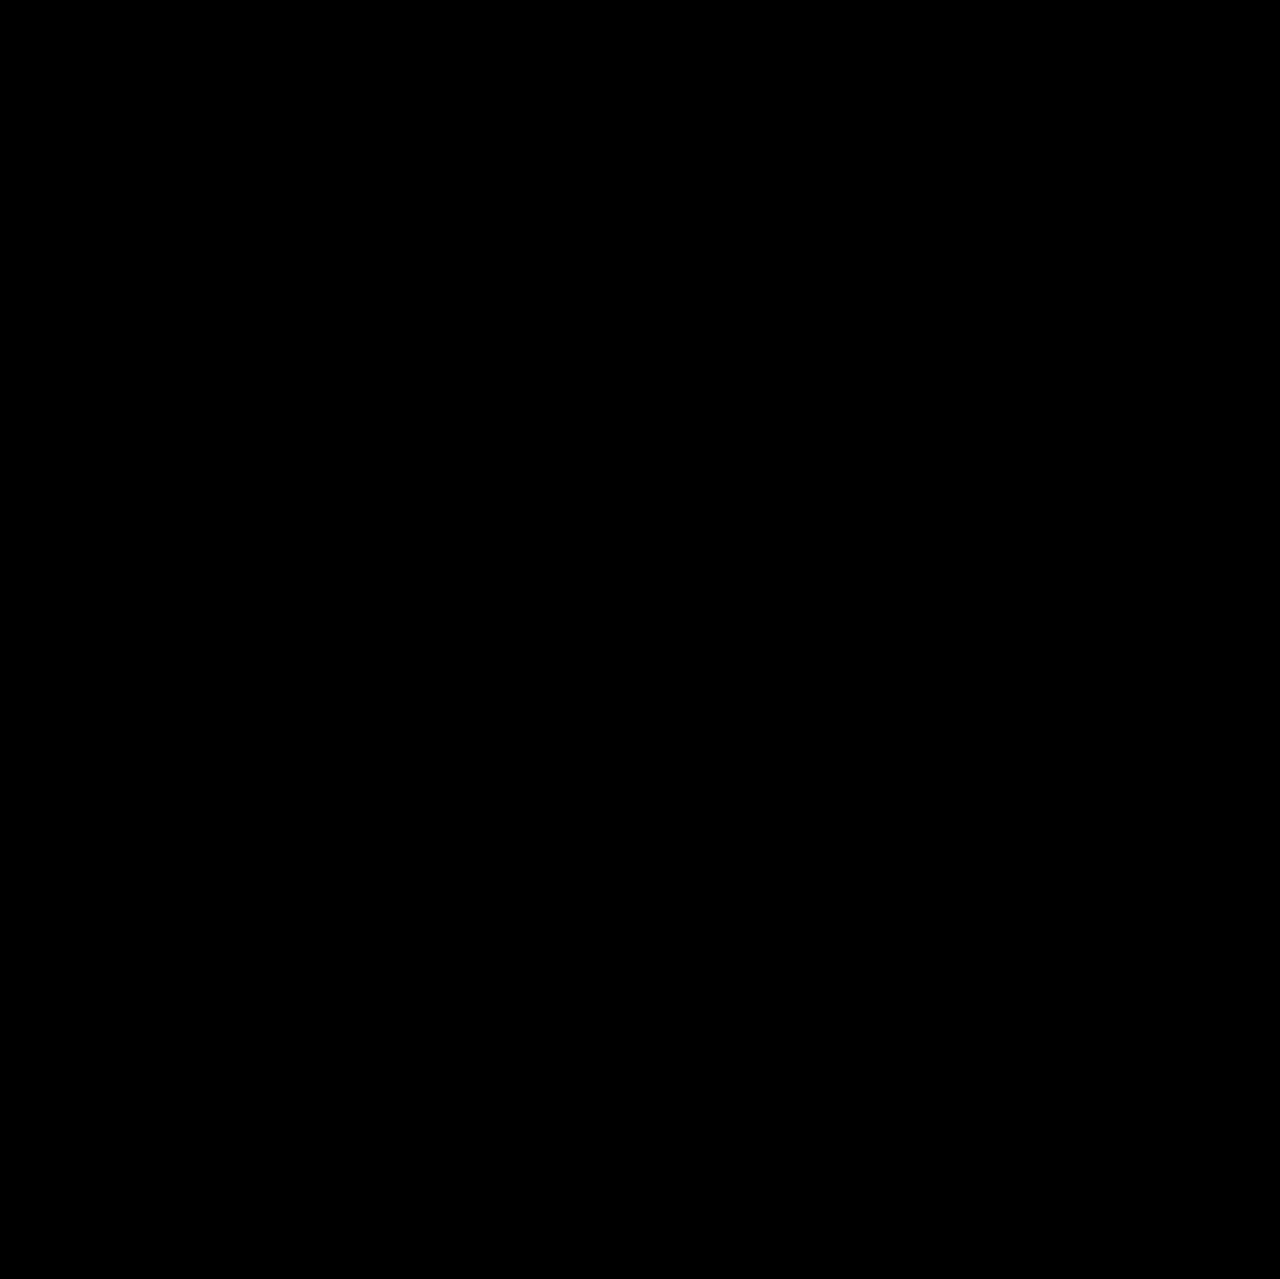 Positive clipart addition. Cross plus symbol sign